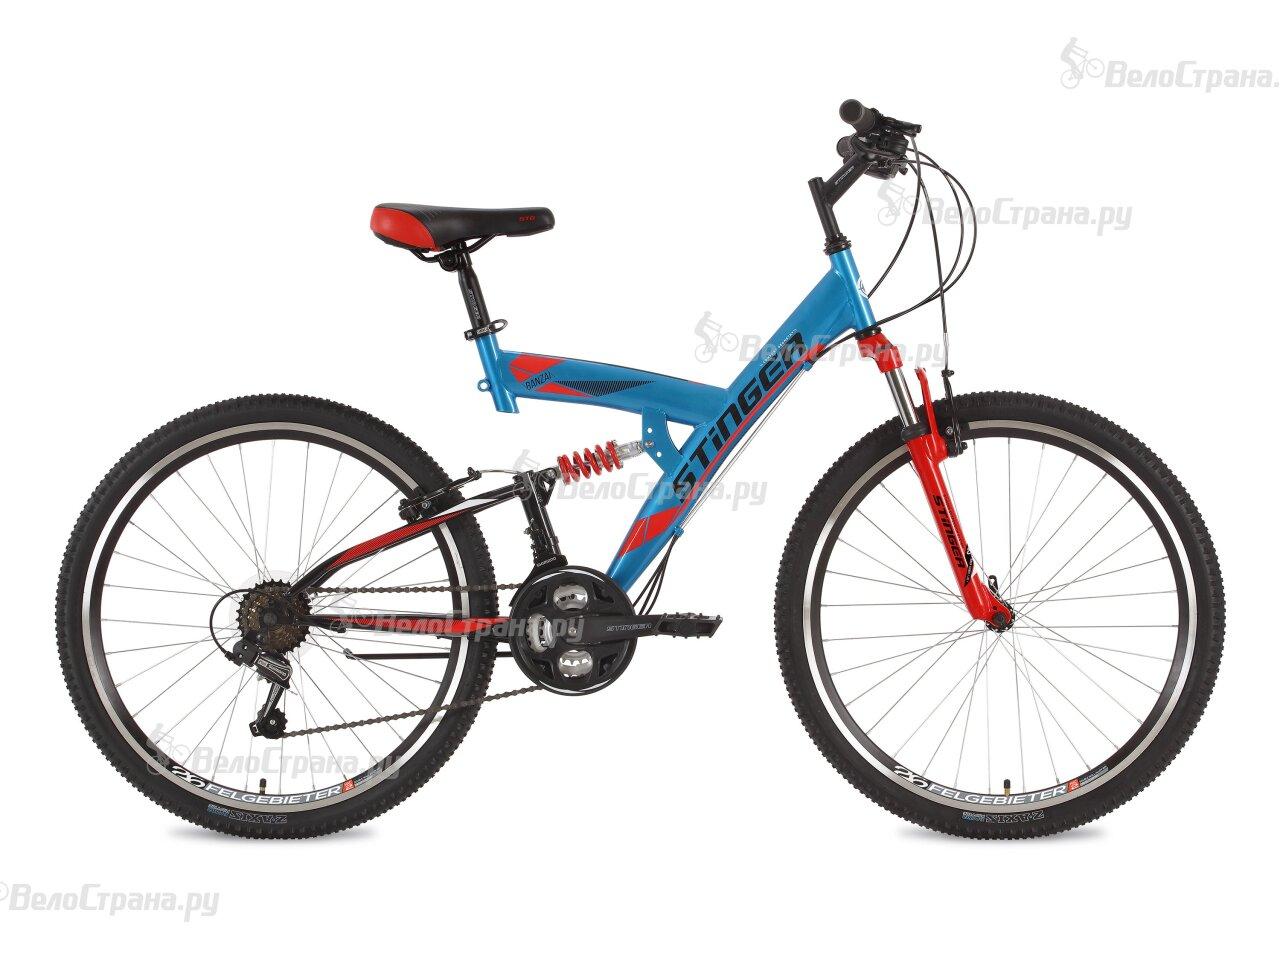 Велосипед Stinger Banzai 26 (2018) stinger banzai 18 2016 х72830 к blue red